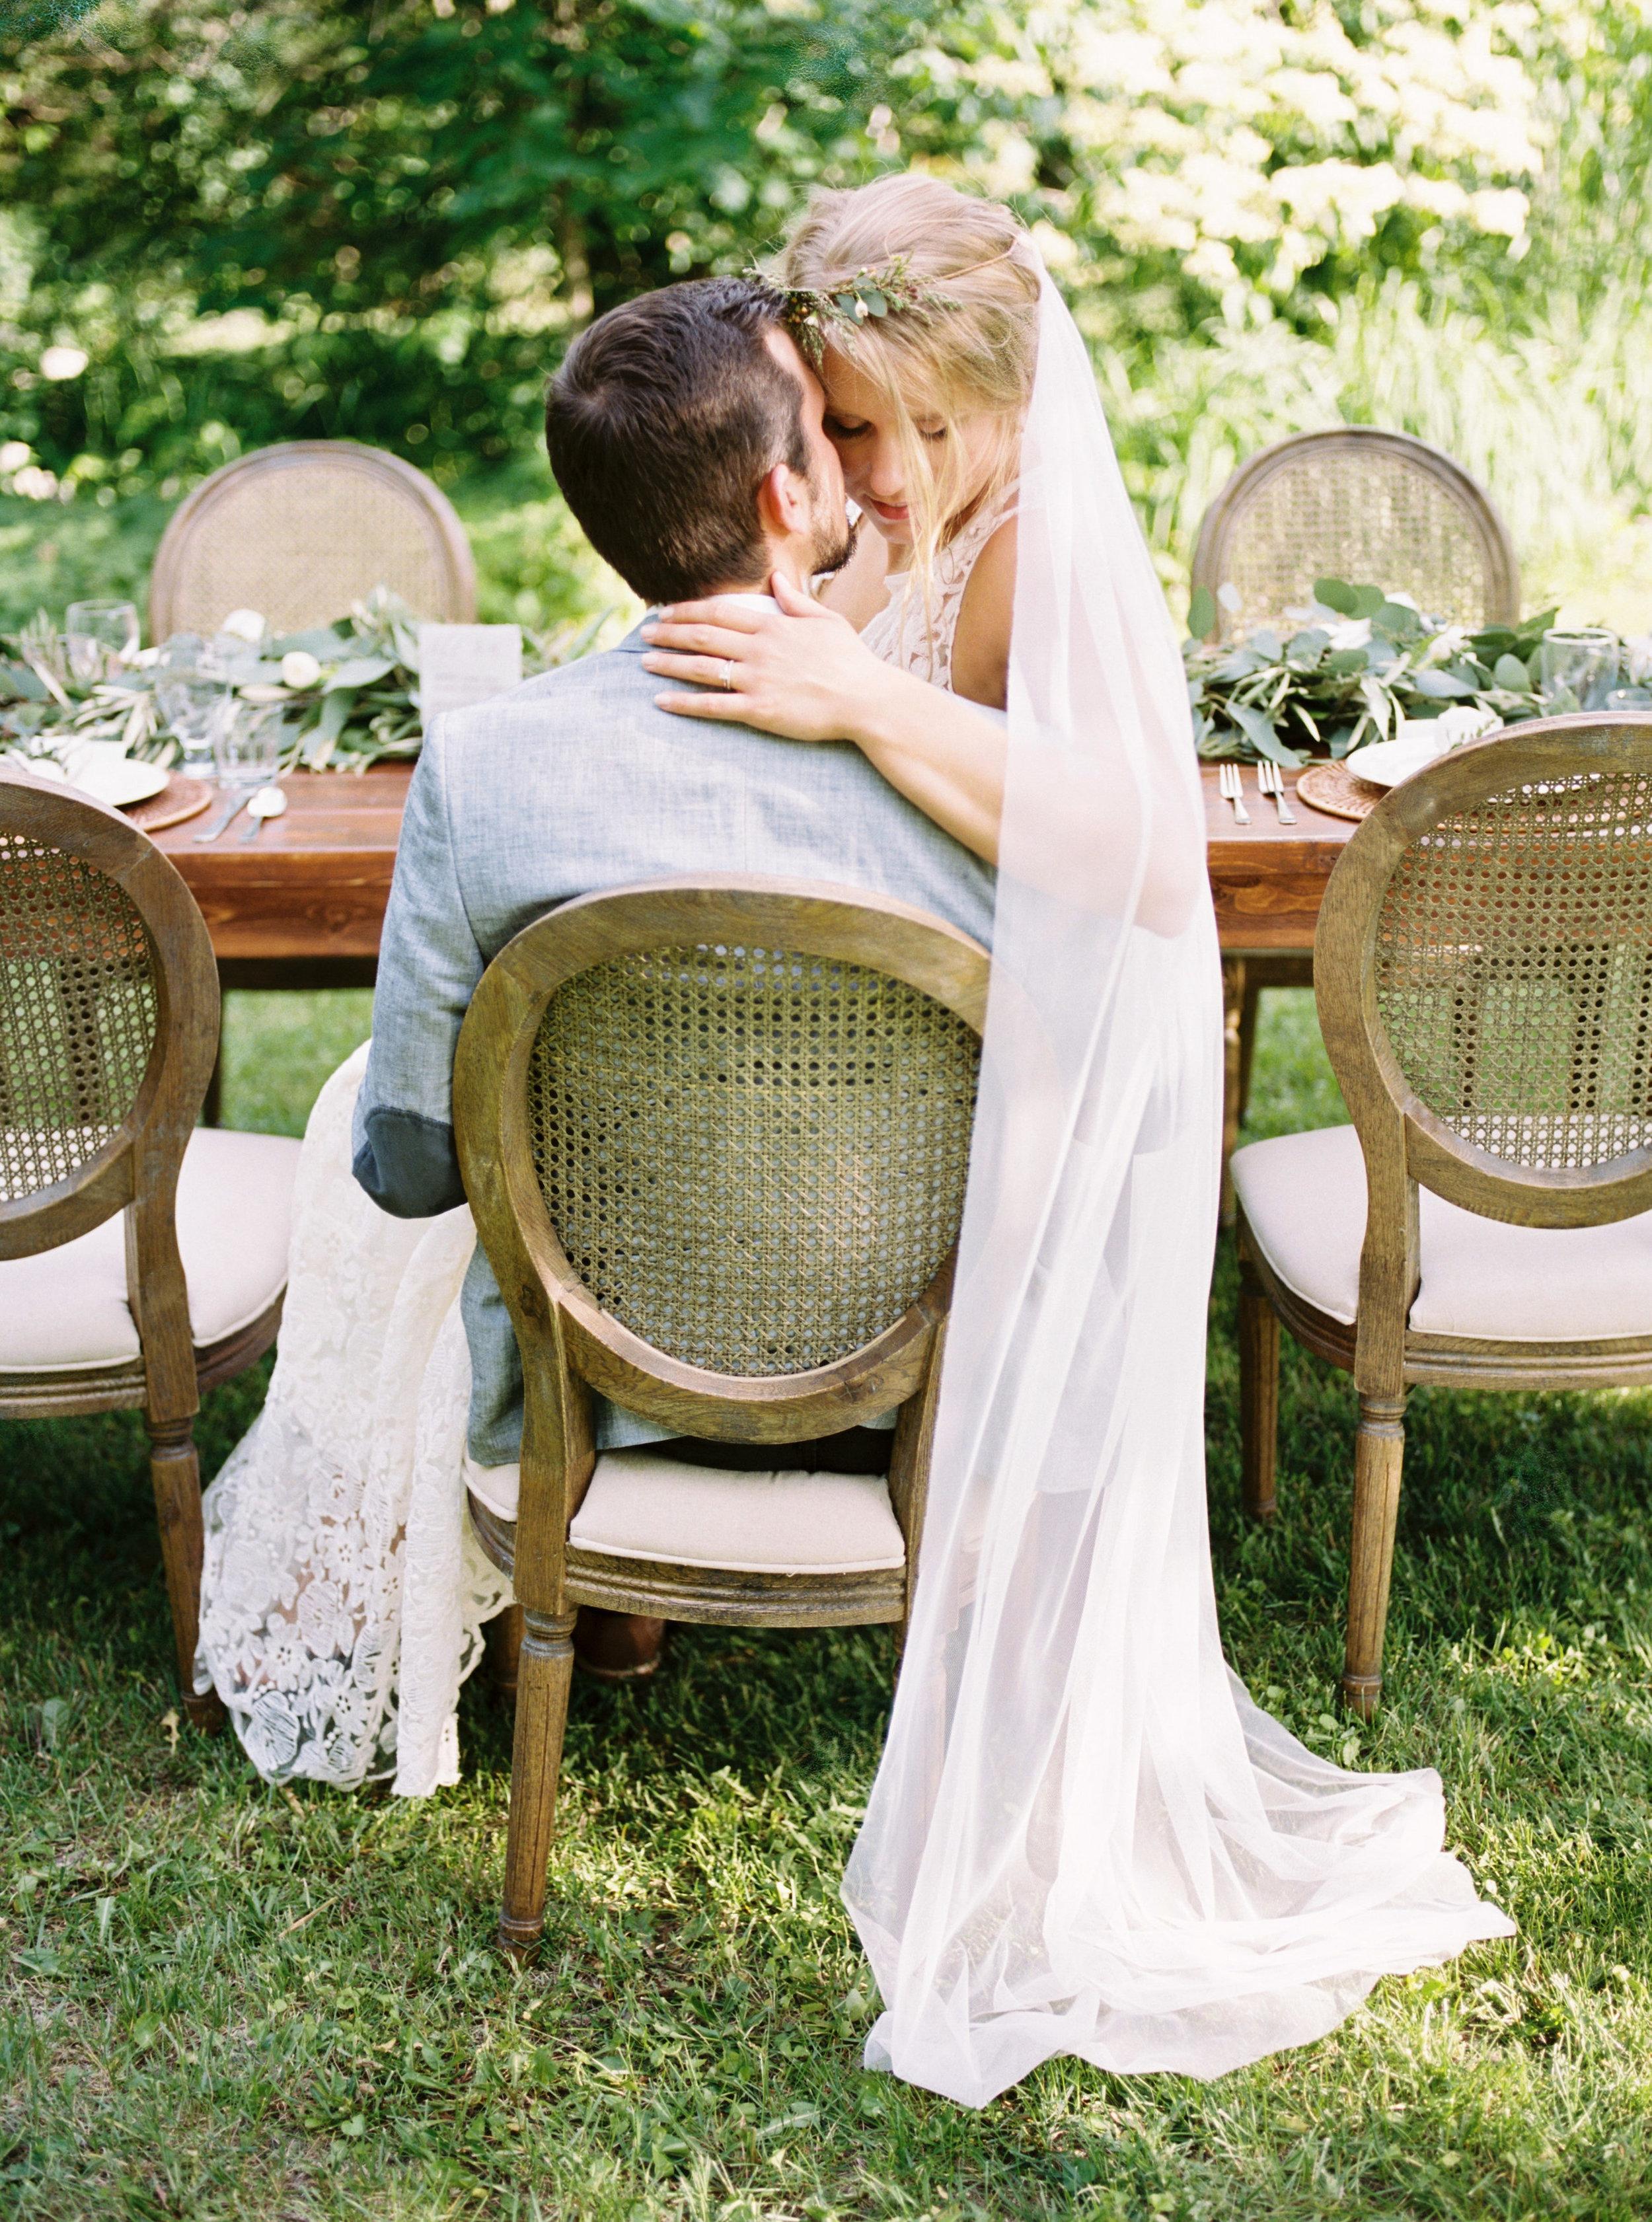 greenhouse-wedding-inspiration-by-laurelyn-savannah-photography-6.jpg